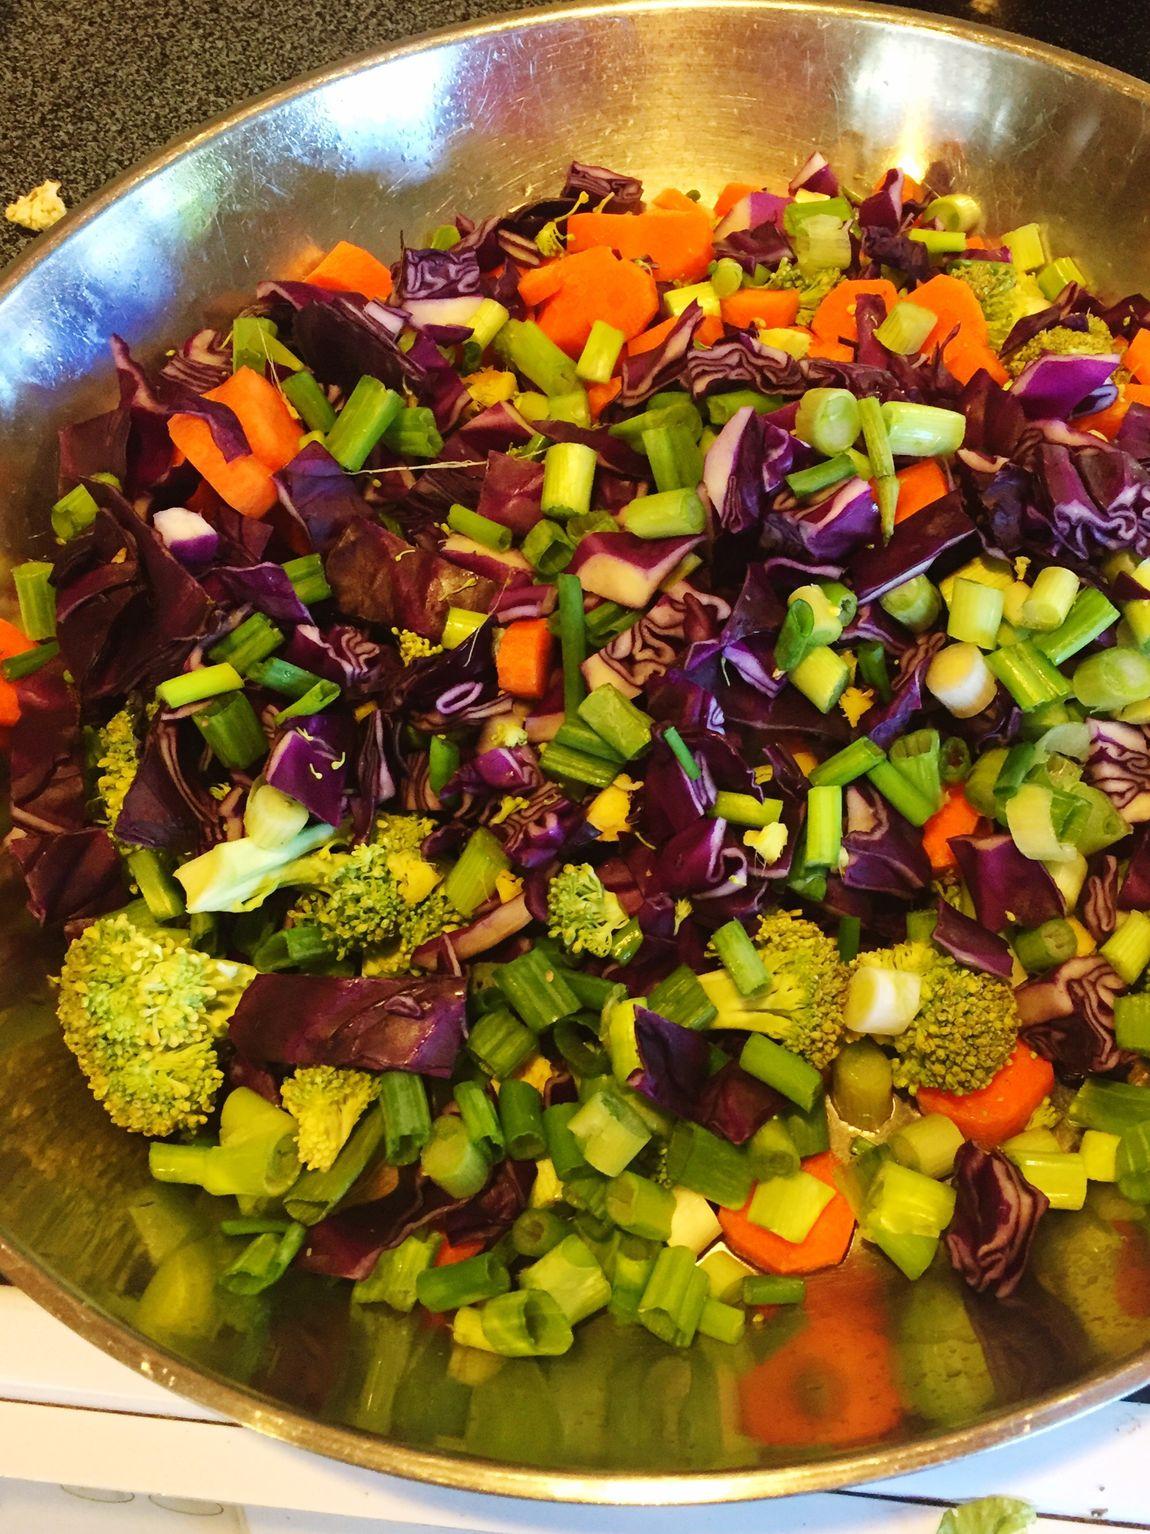 Food Vegetable Healthy Eating Freshness Vegan Vegetables Vegetarian Vegetarian Food Vegan Food Veganfoodporn Veganfoodshare Plantbased Plantbasedfood EyeEmNewHere